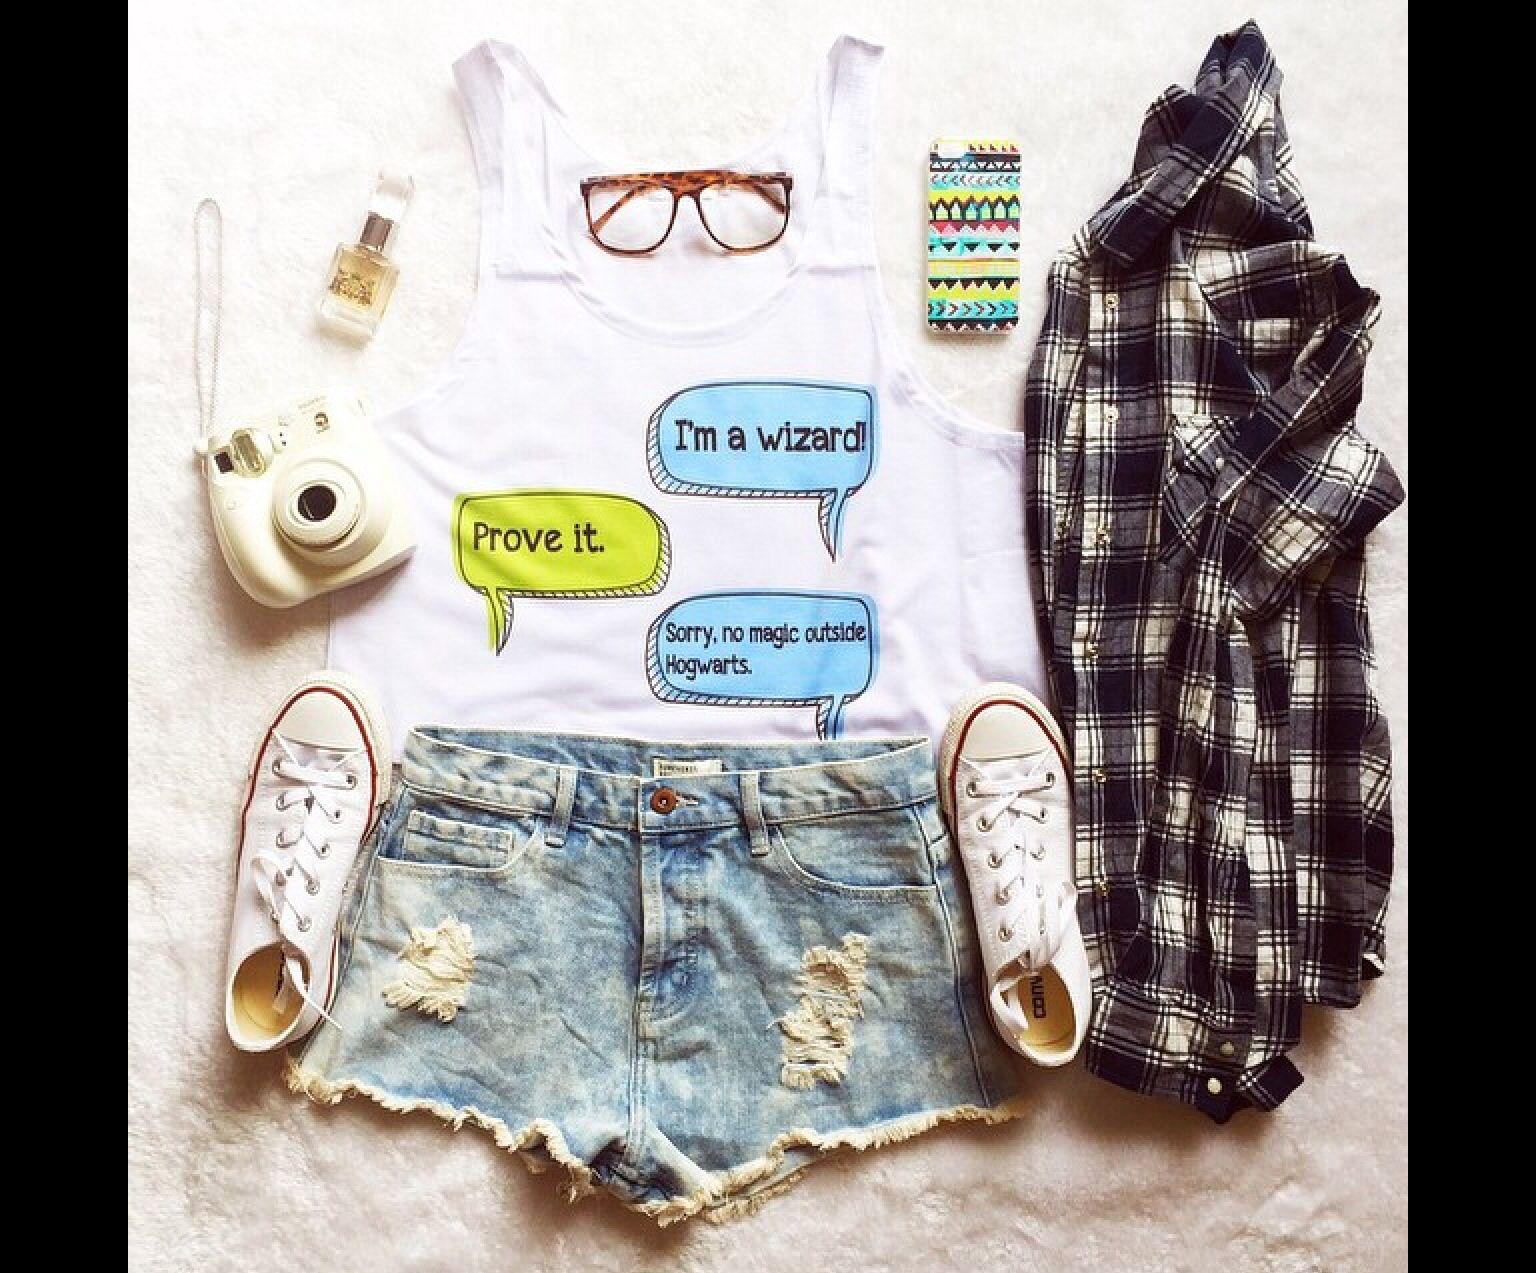 www.shopkollage.com